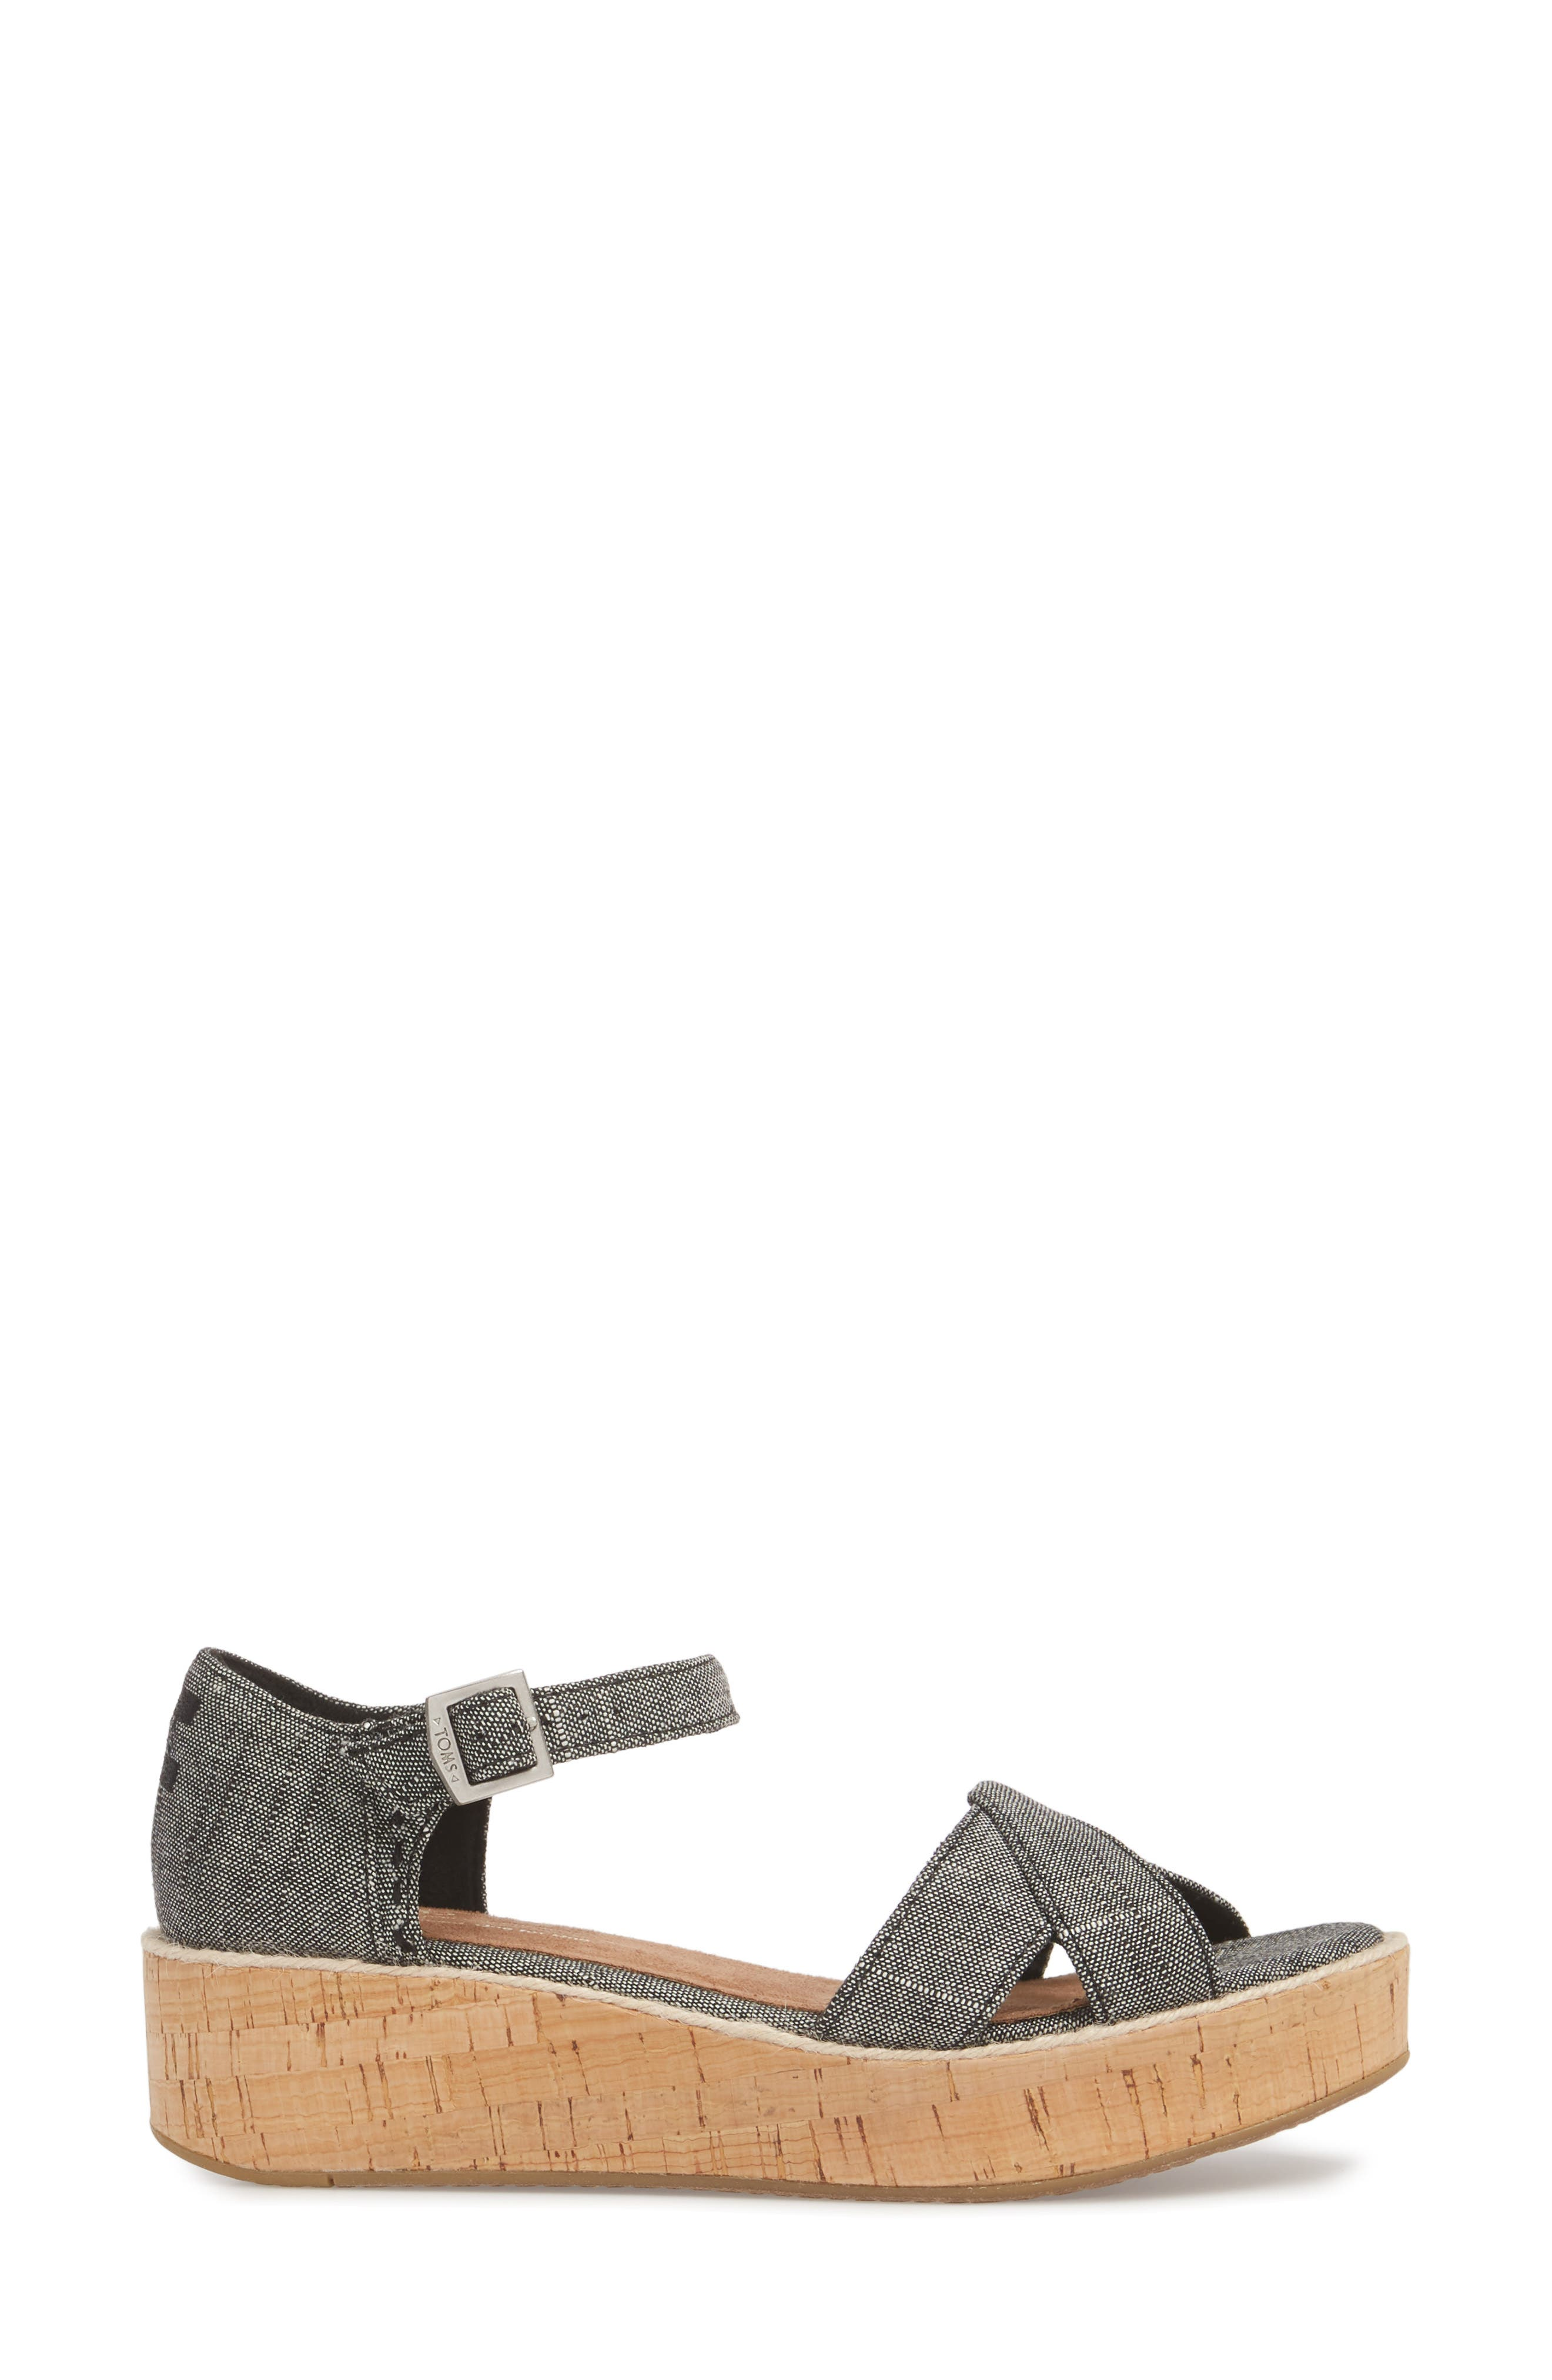 Harper Platform Sandal,                             Alternate thumbnail 3, color,                             001